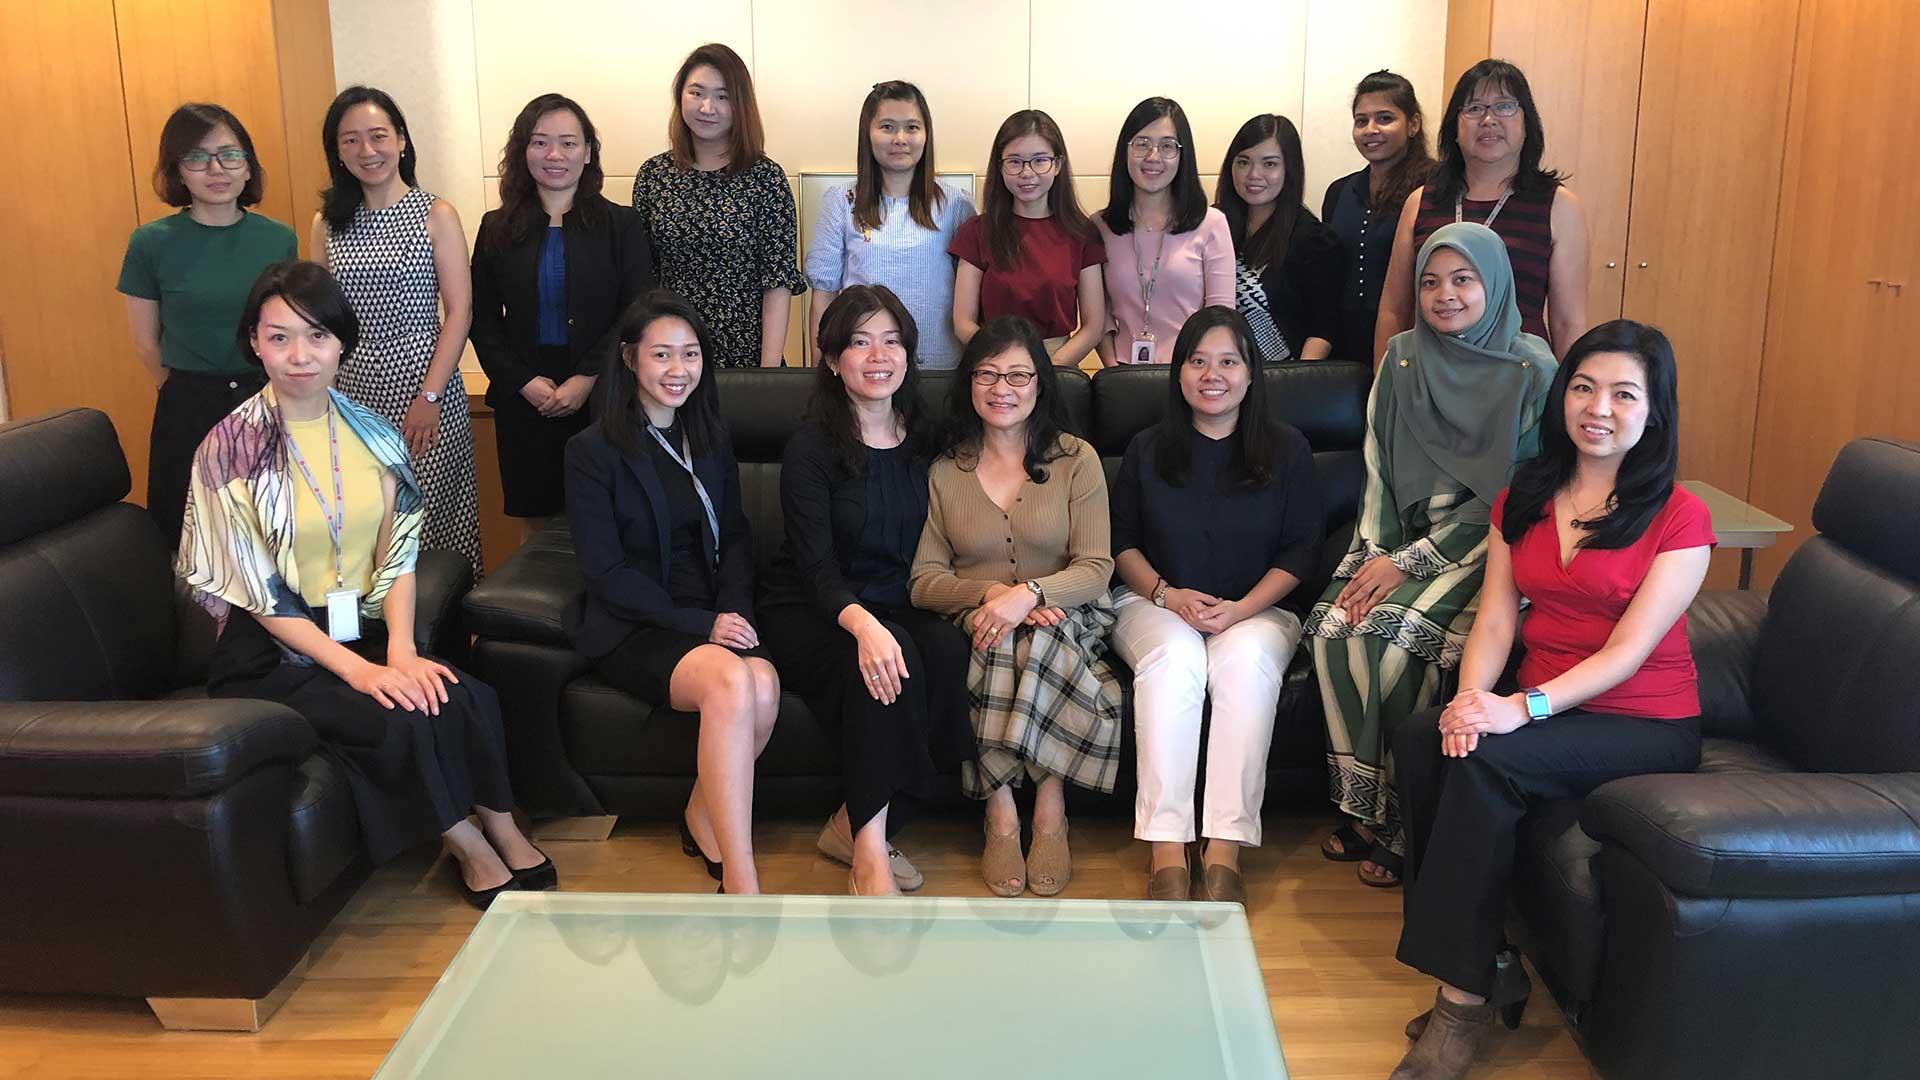 Texchem Ladies' Club – Quarterly Sharing Session with Dr Pun Meng Yan, Deputy MD of Texchem Polymers Sdn Bhd